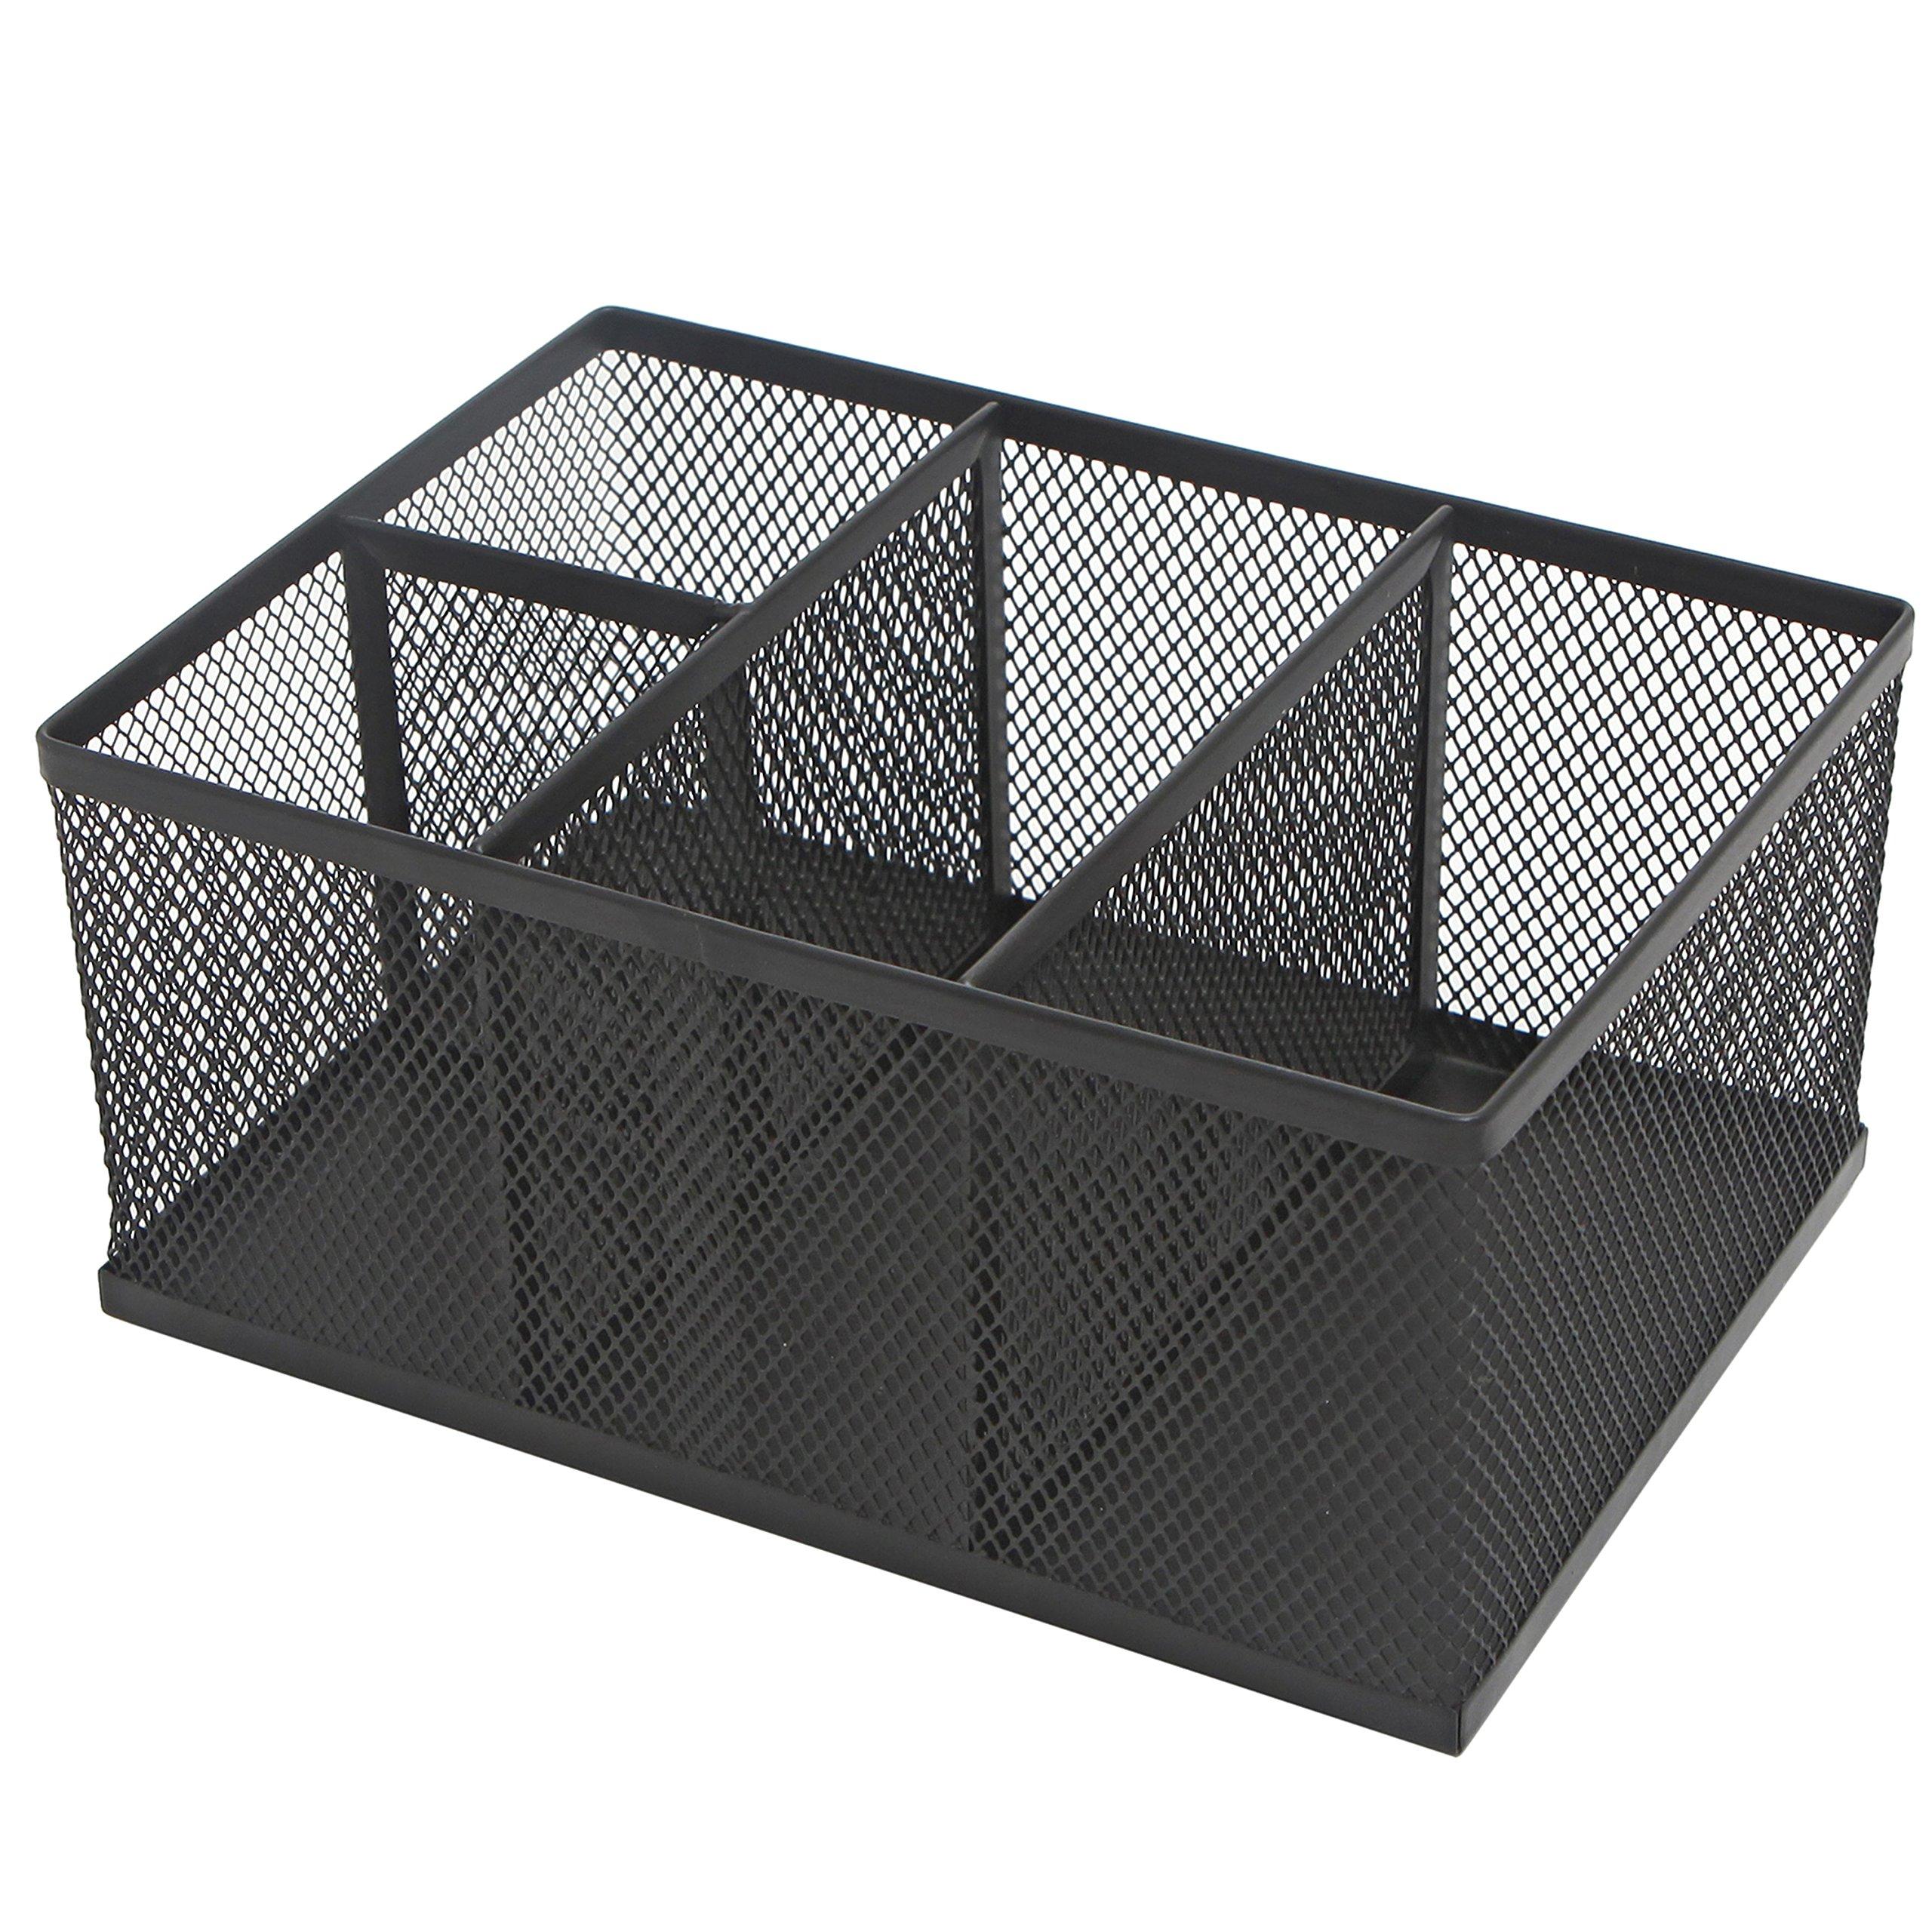 Modern Rectangular Black Metal Mesh 4 Compartment Office Supplies Storage Organizer Caddy Rack - MyGift